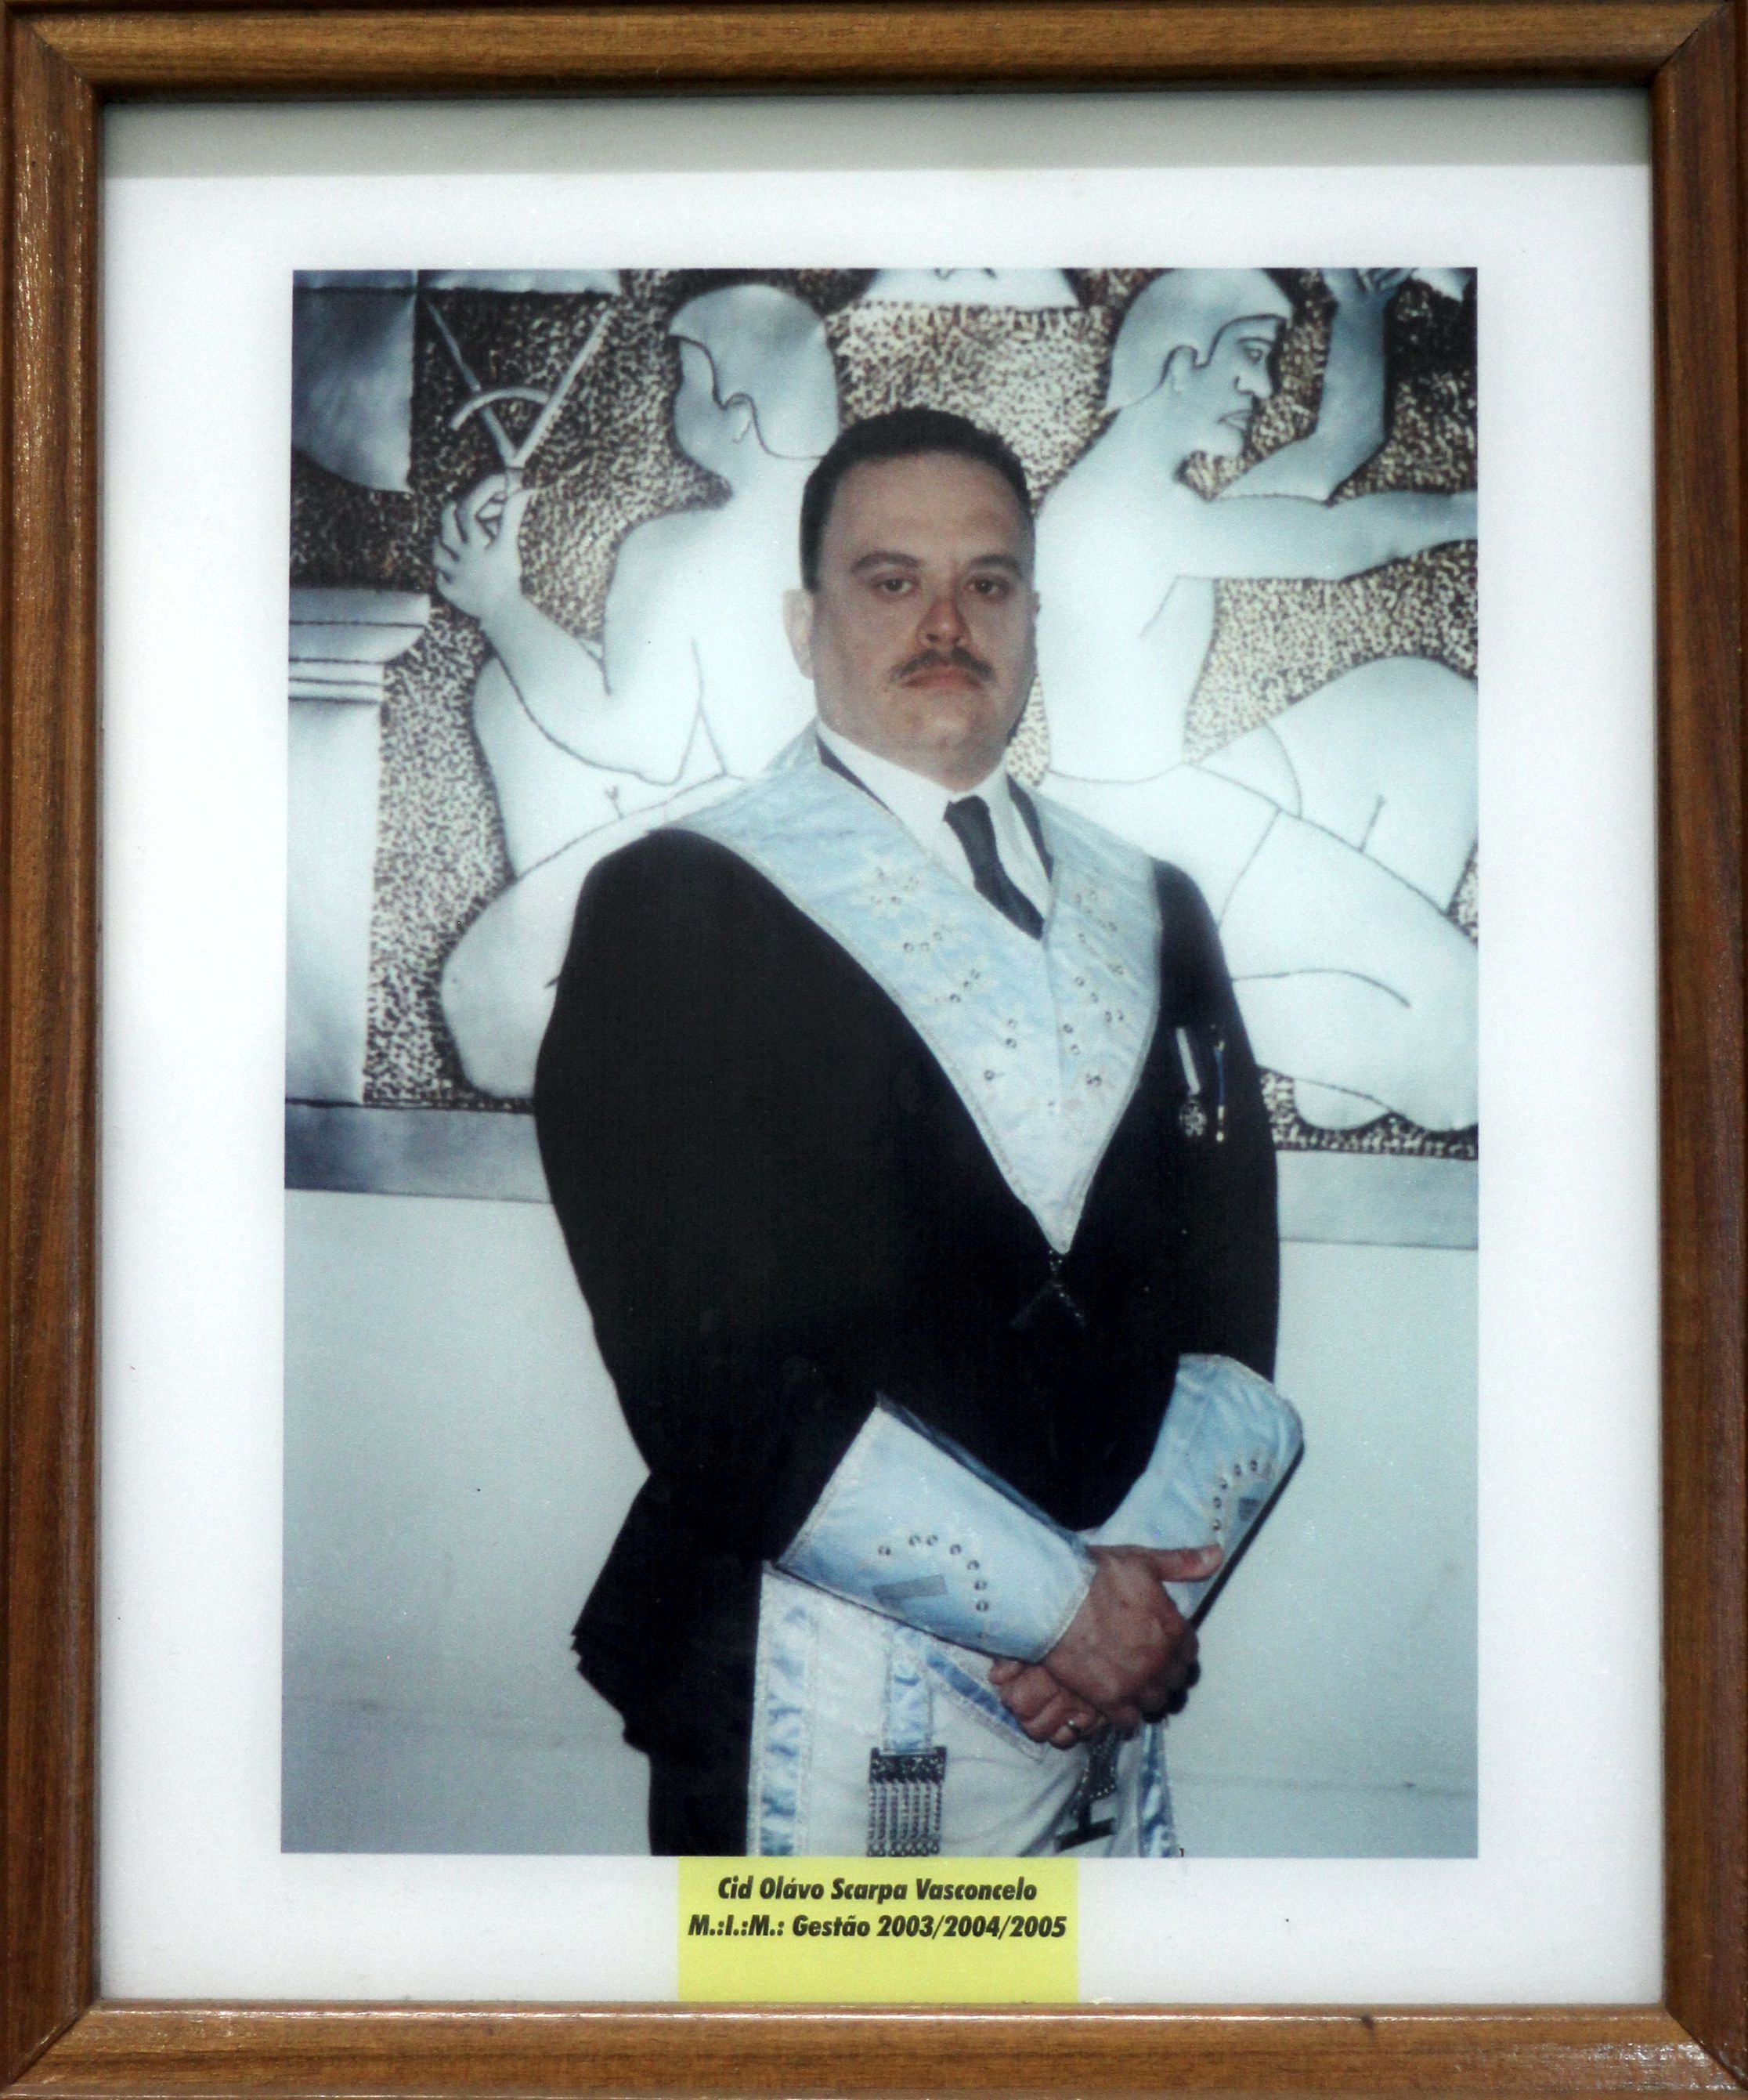 18 - Cis Olavo Scarpa Vasconcelo